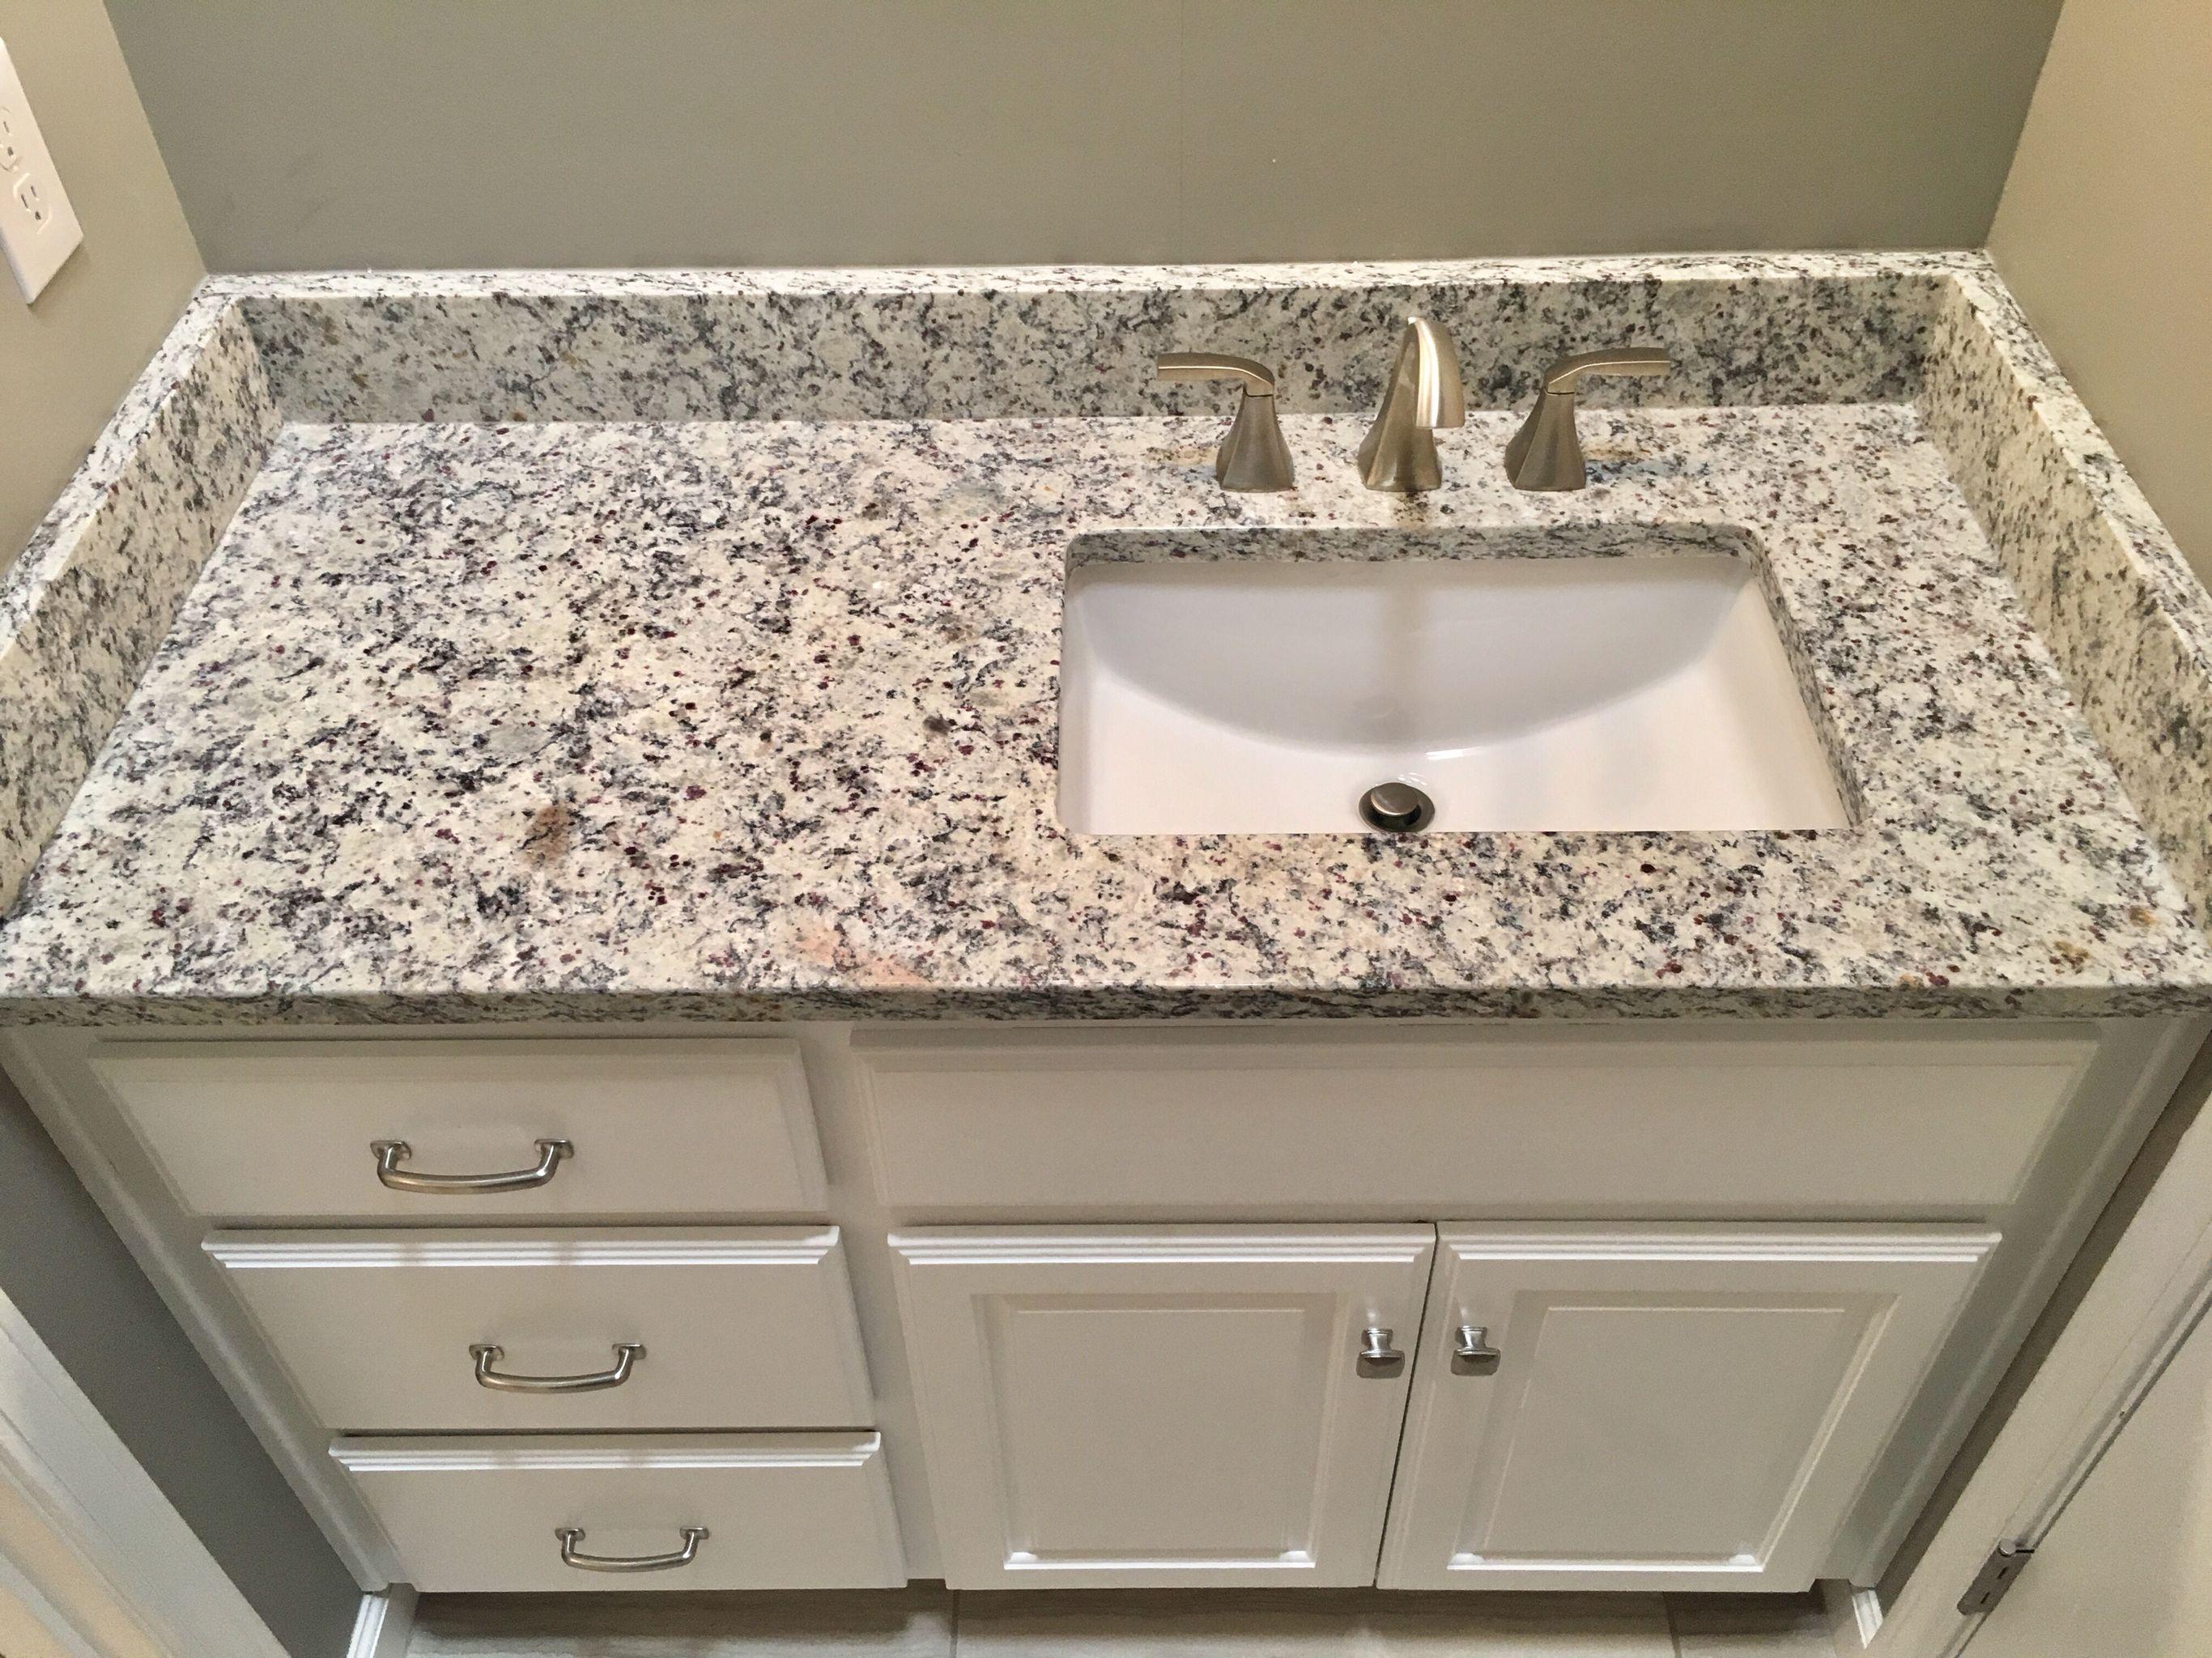 white kitchen sink undermount bags ashen granite countertops moen 8 quot widespread faucet